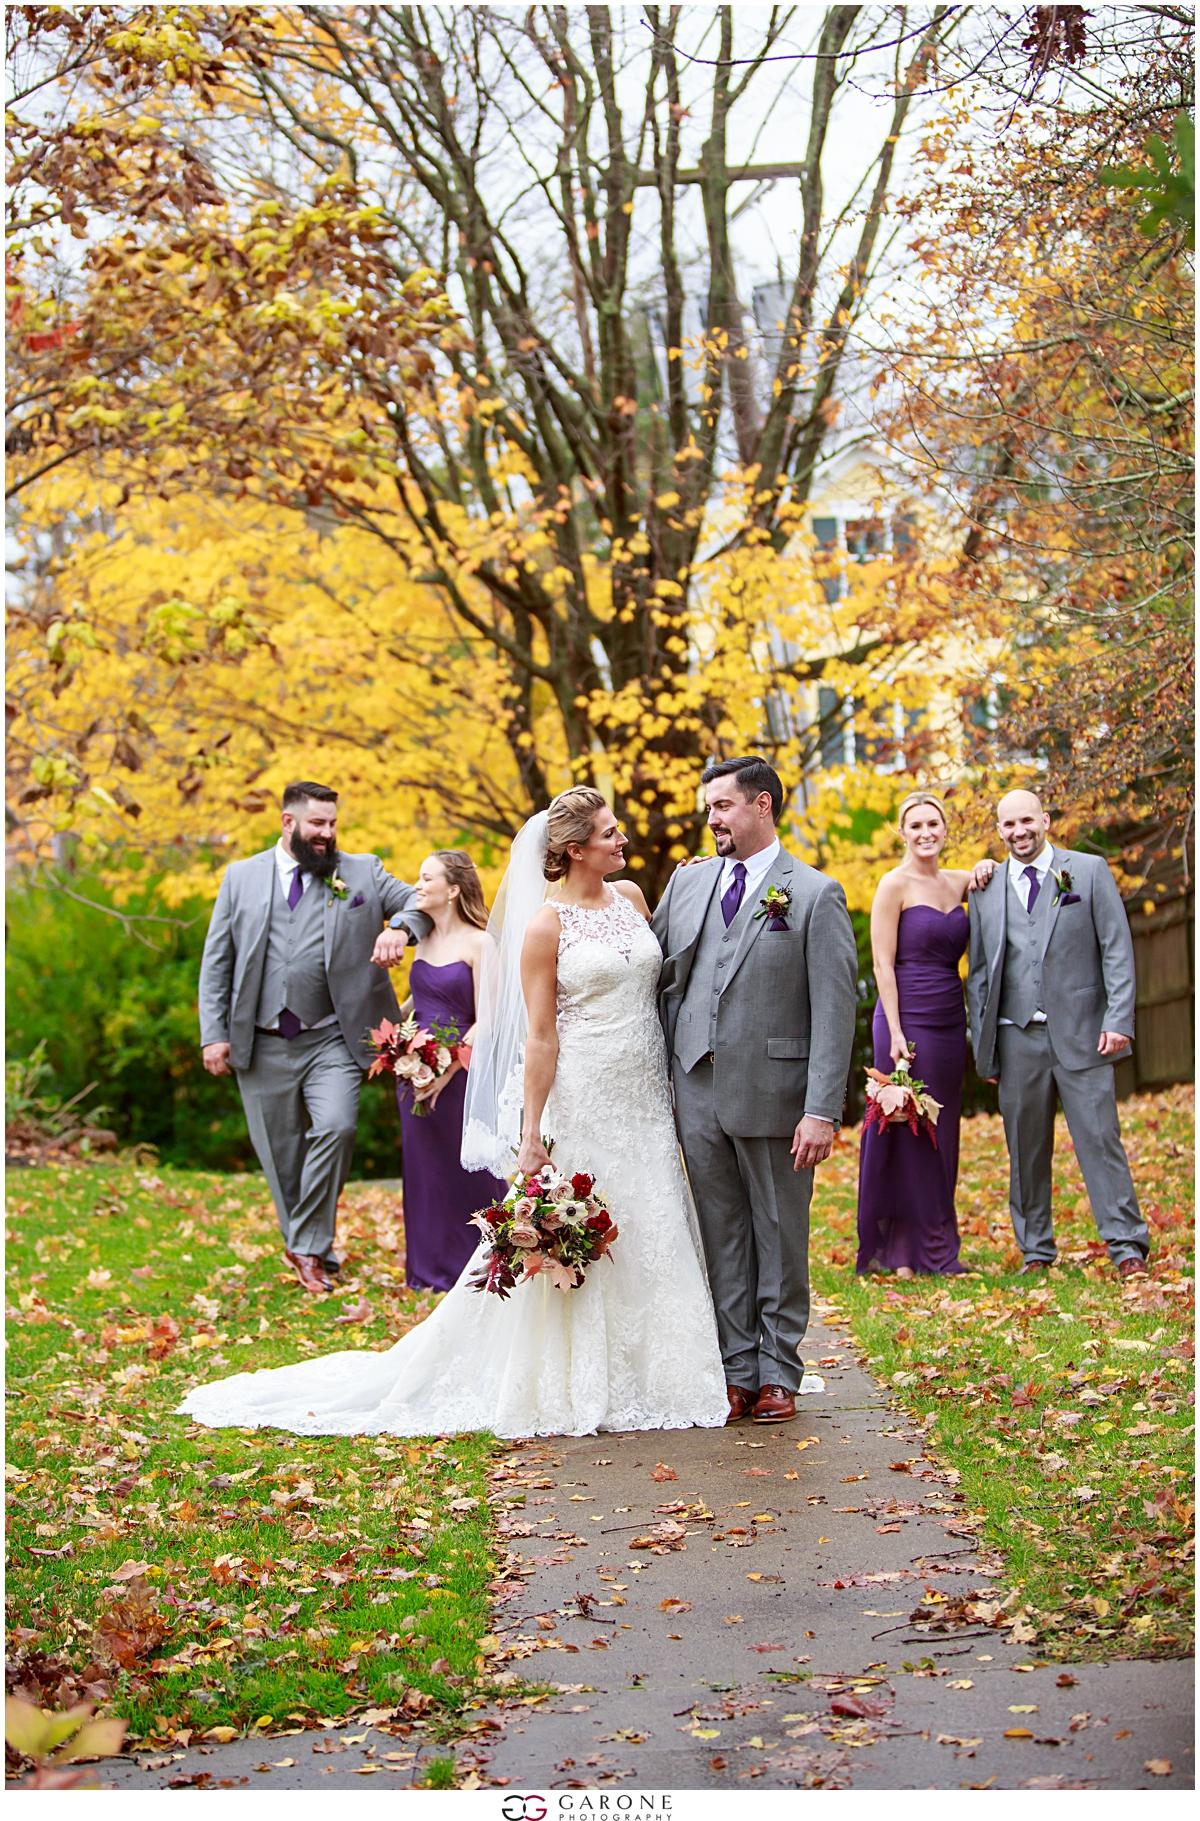 Kate_Chris_Atlantica_Cohasset_Massachusettes_Boston_Wedding_Photography_Garone_Photography_0014.jpg